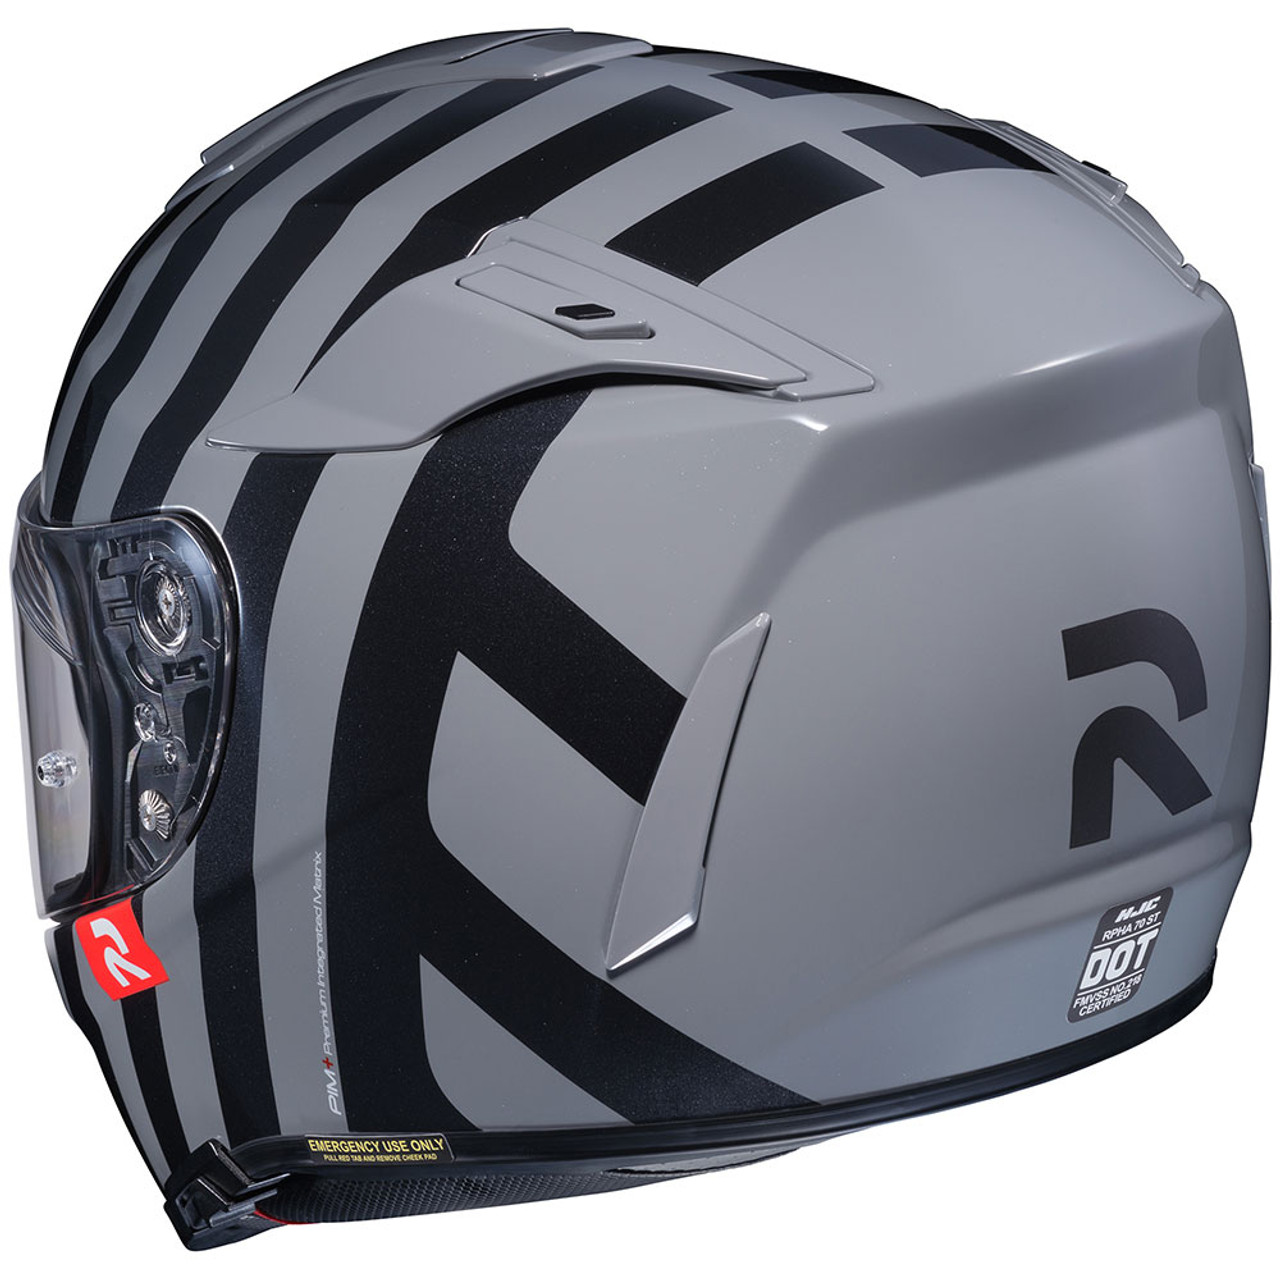 hjc rpha 70 st forvic helmet get lowered cycles. Black Bedroom Furniture Sets. Home Design Ideas